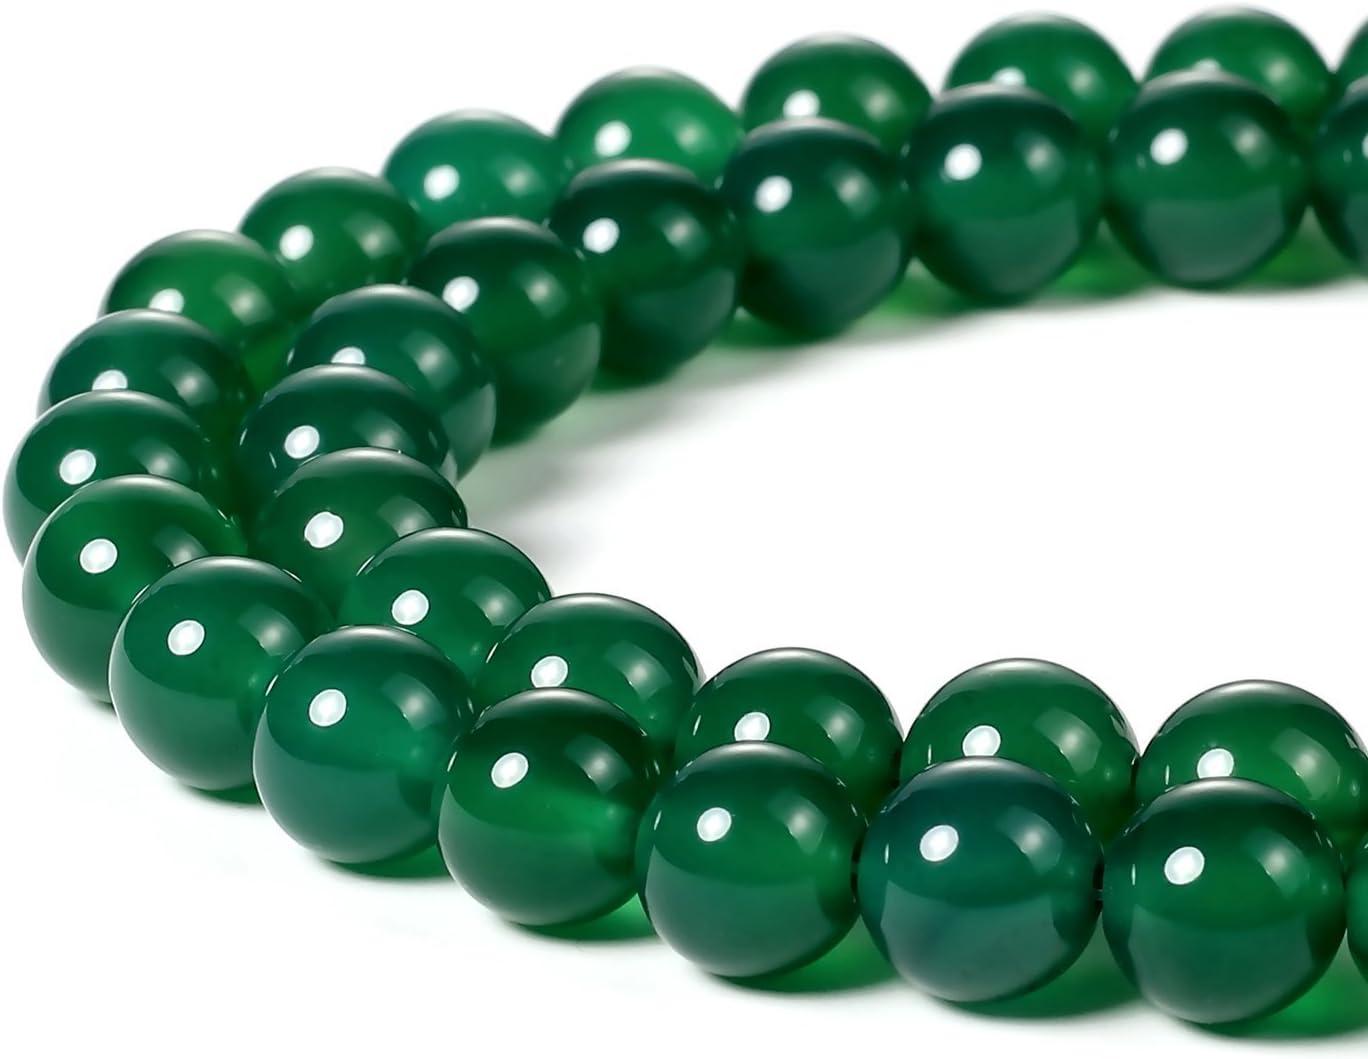 6mm Genuine Natural 7 Chakra Gemstone Grade AAA Round Loose Beads 15.5 Full Strand 80007120-A242